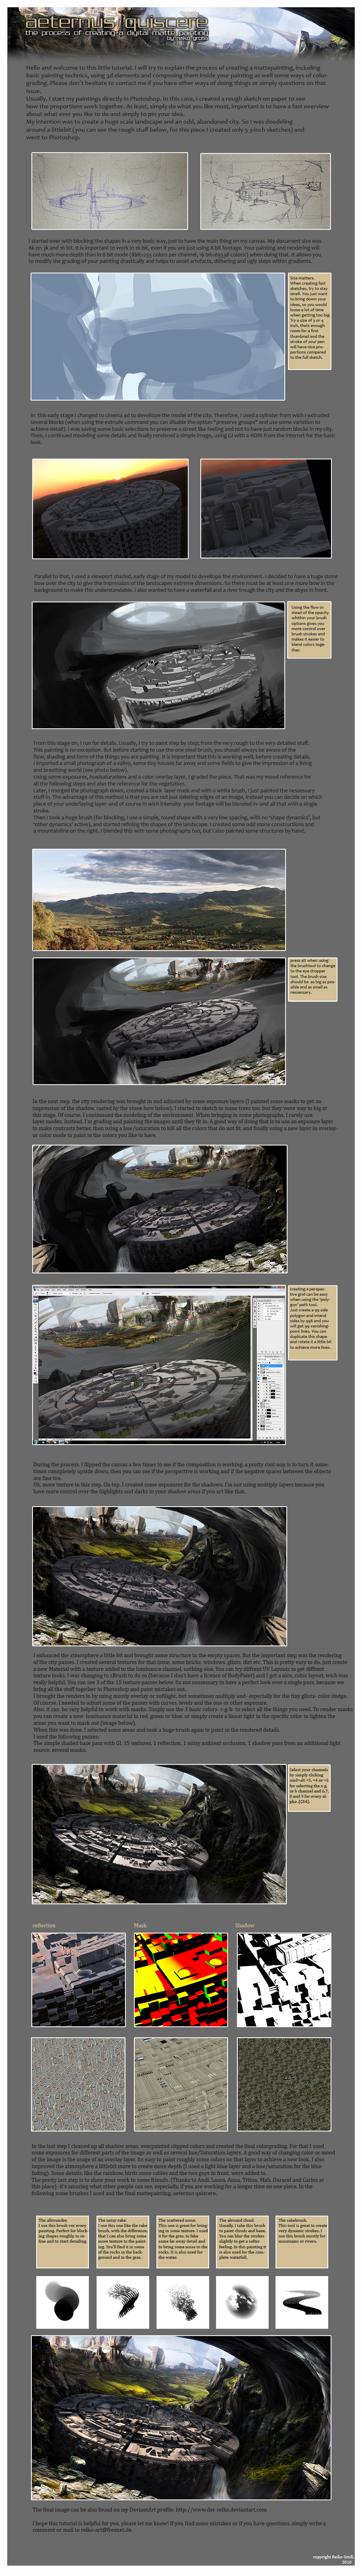 matte painting tutorial by Der-Reiko